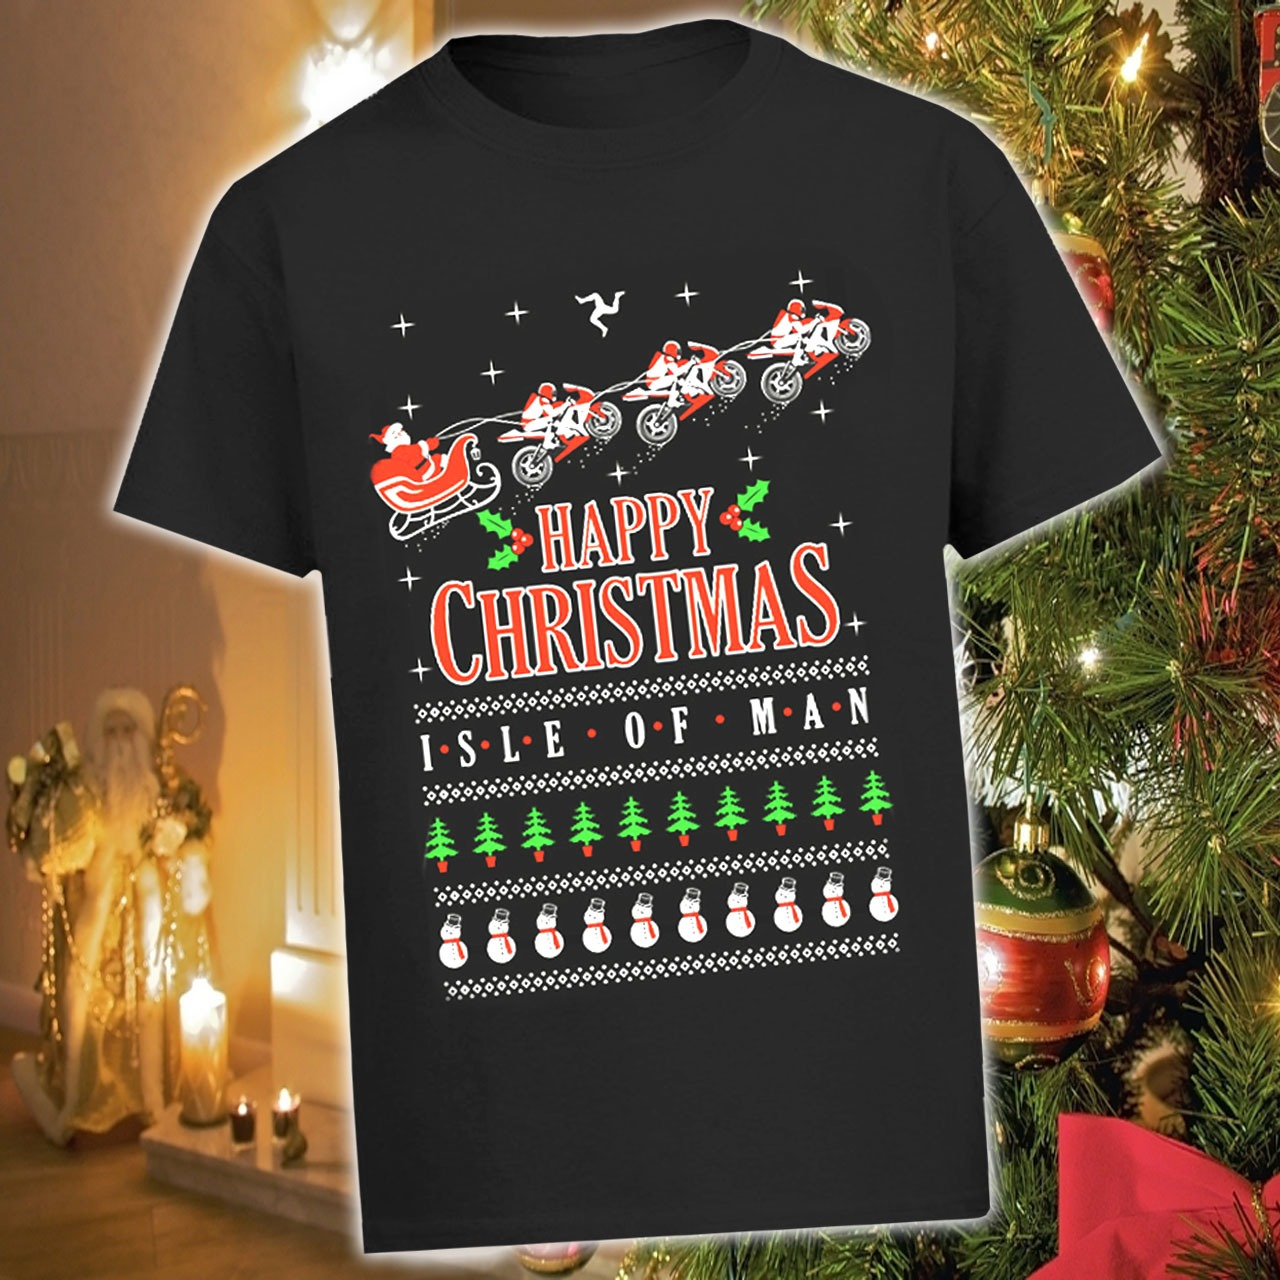 Black xmas t shirt - Black Christmas T Shirt Xmas Ats1